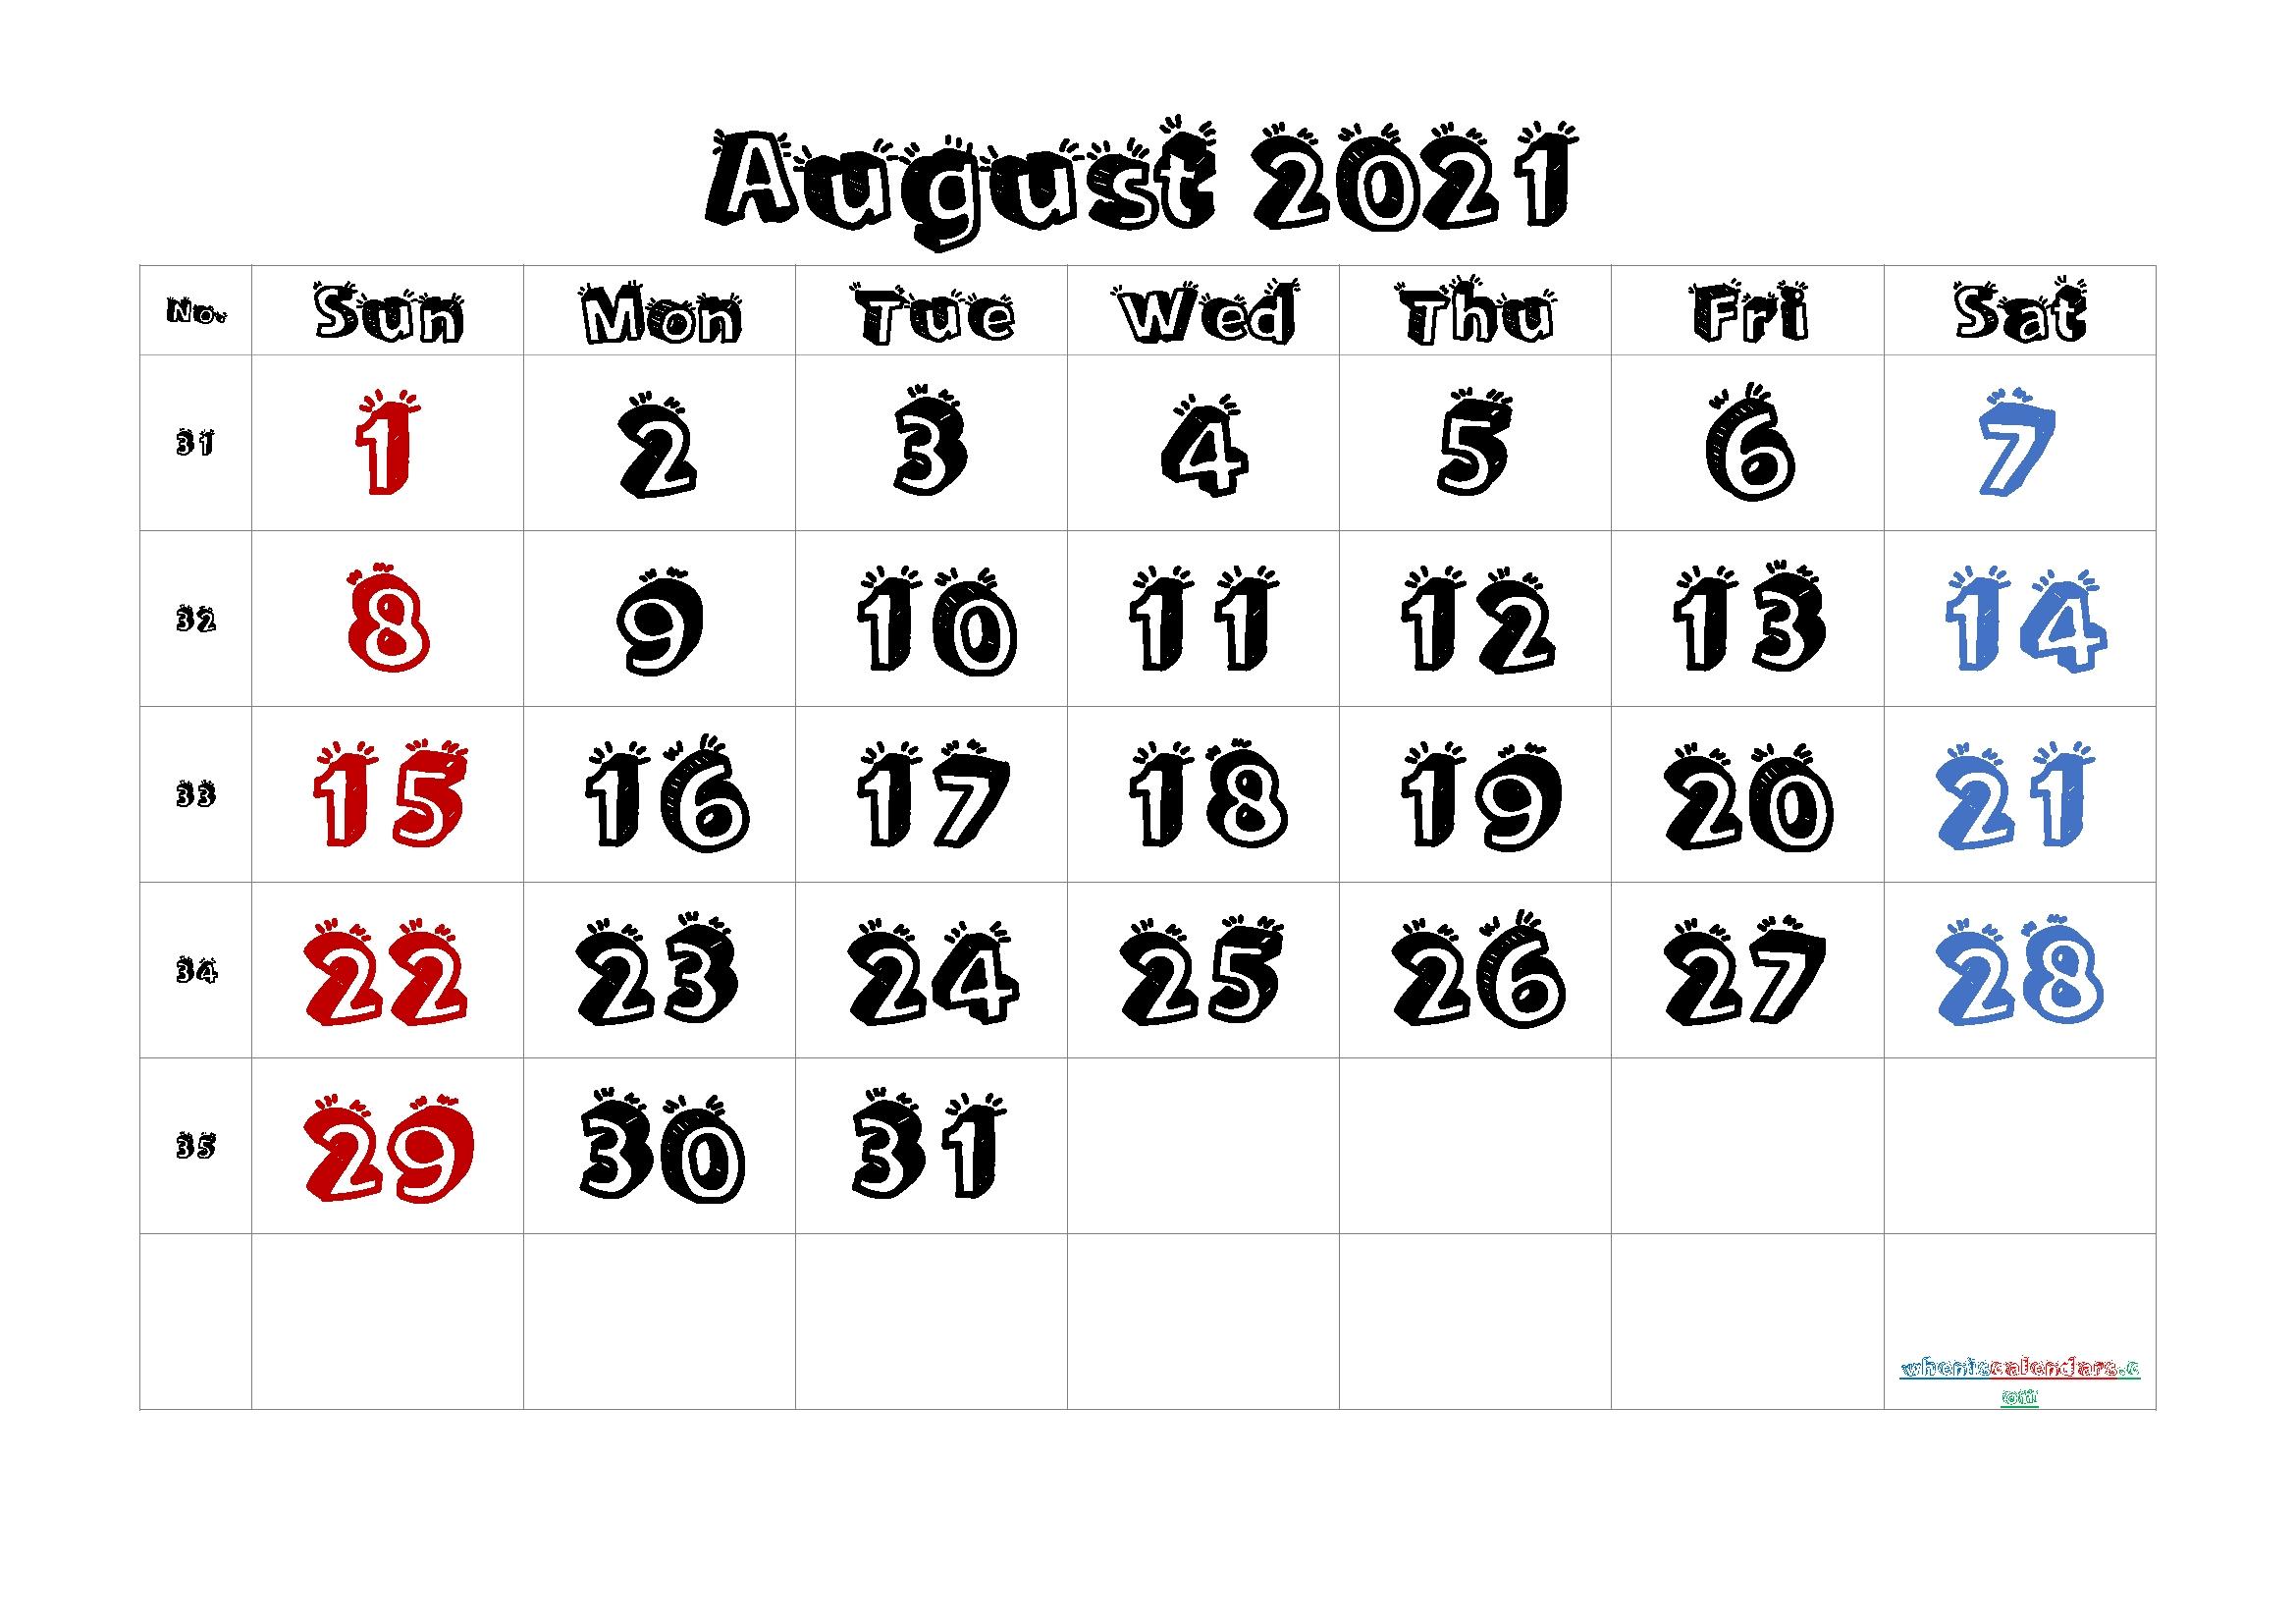 Free Printable August 2021 Calendar August 2021 Calendar With Holidays Usa